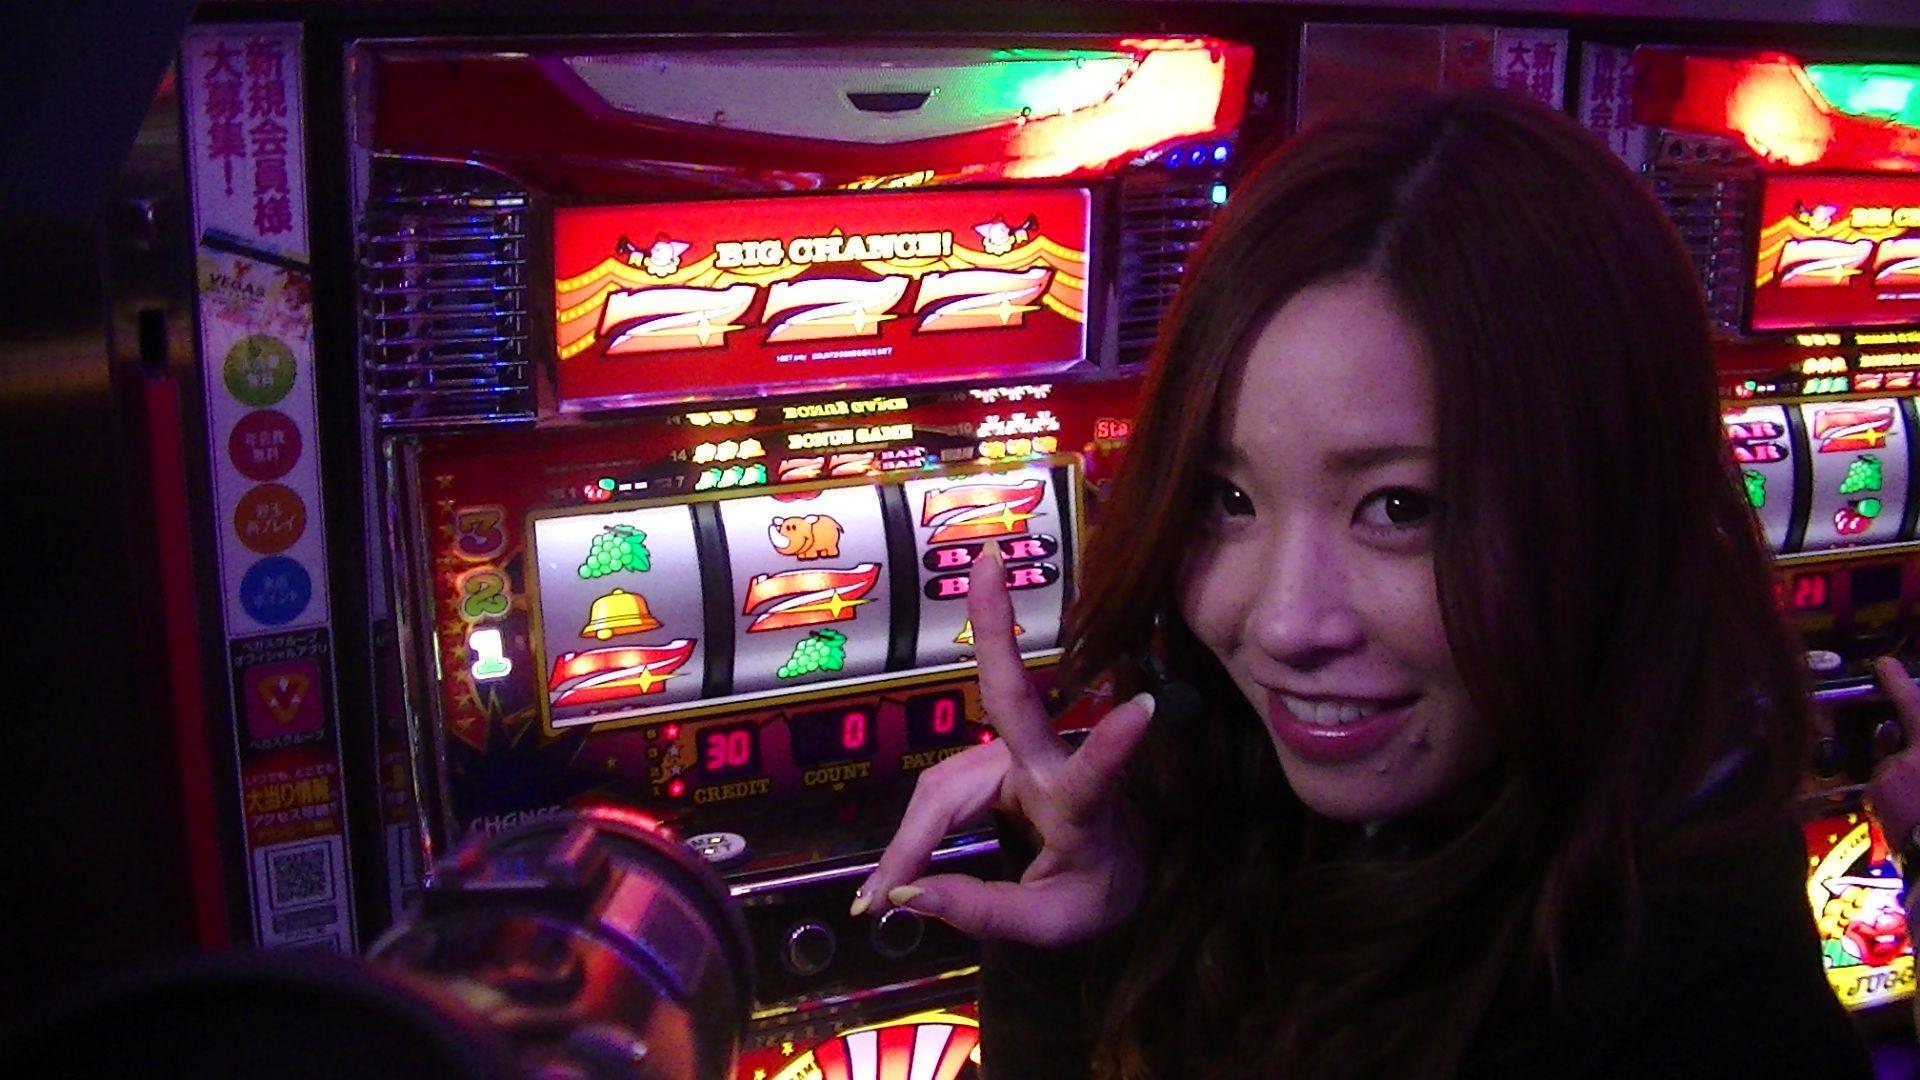 GO!GO! やったねビッグボーナス!! #vegas1200 #七瀬静香 #TV ...